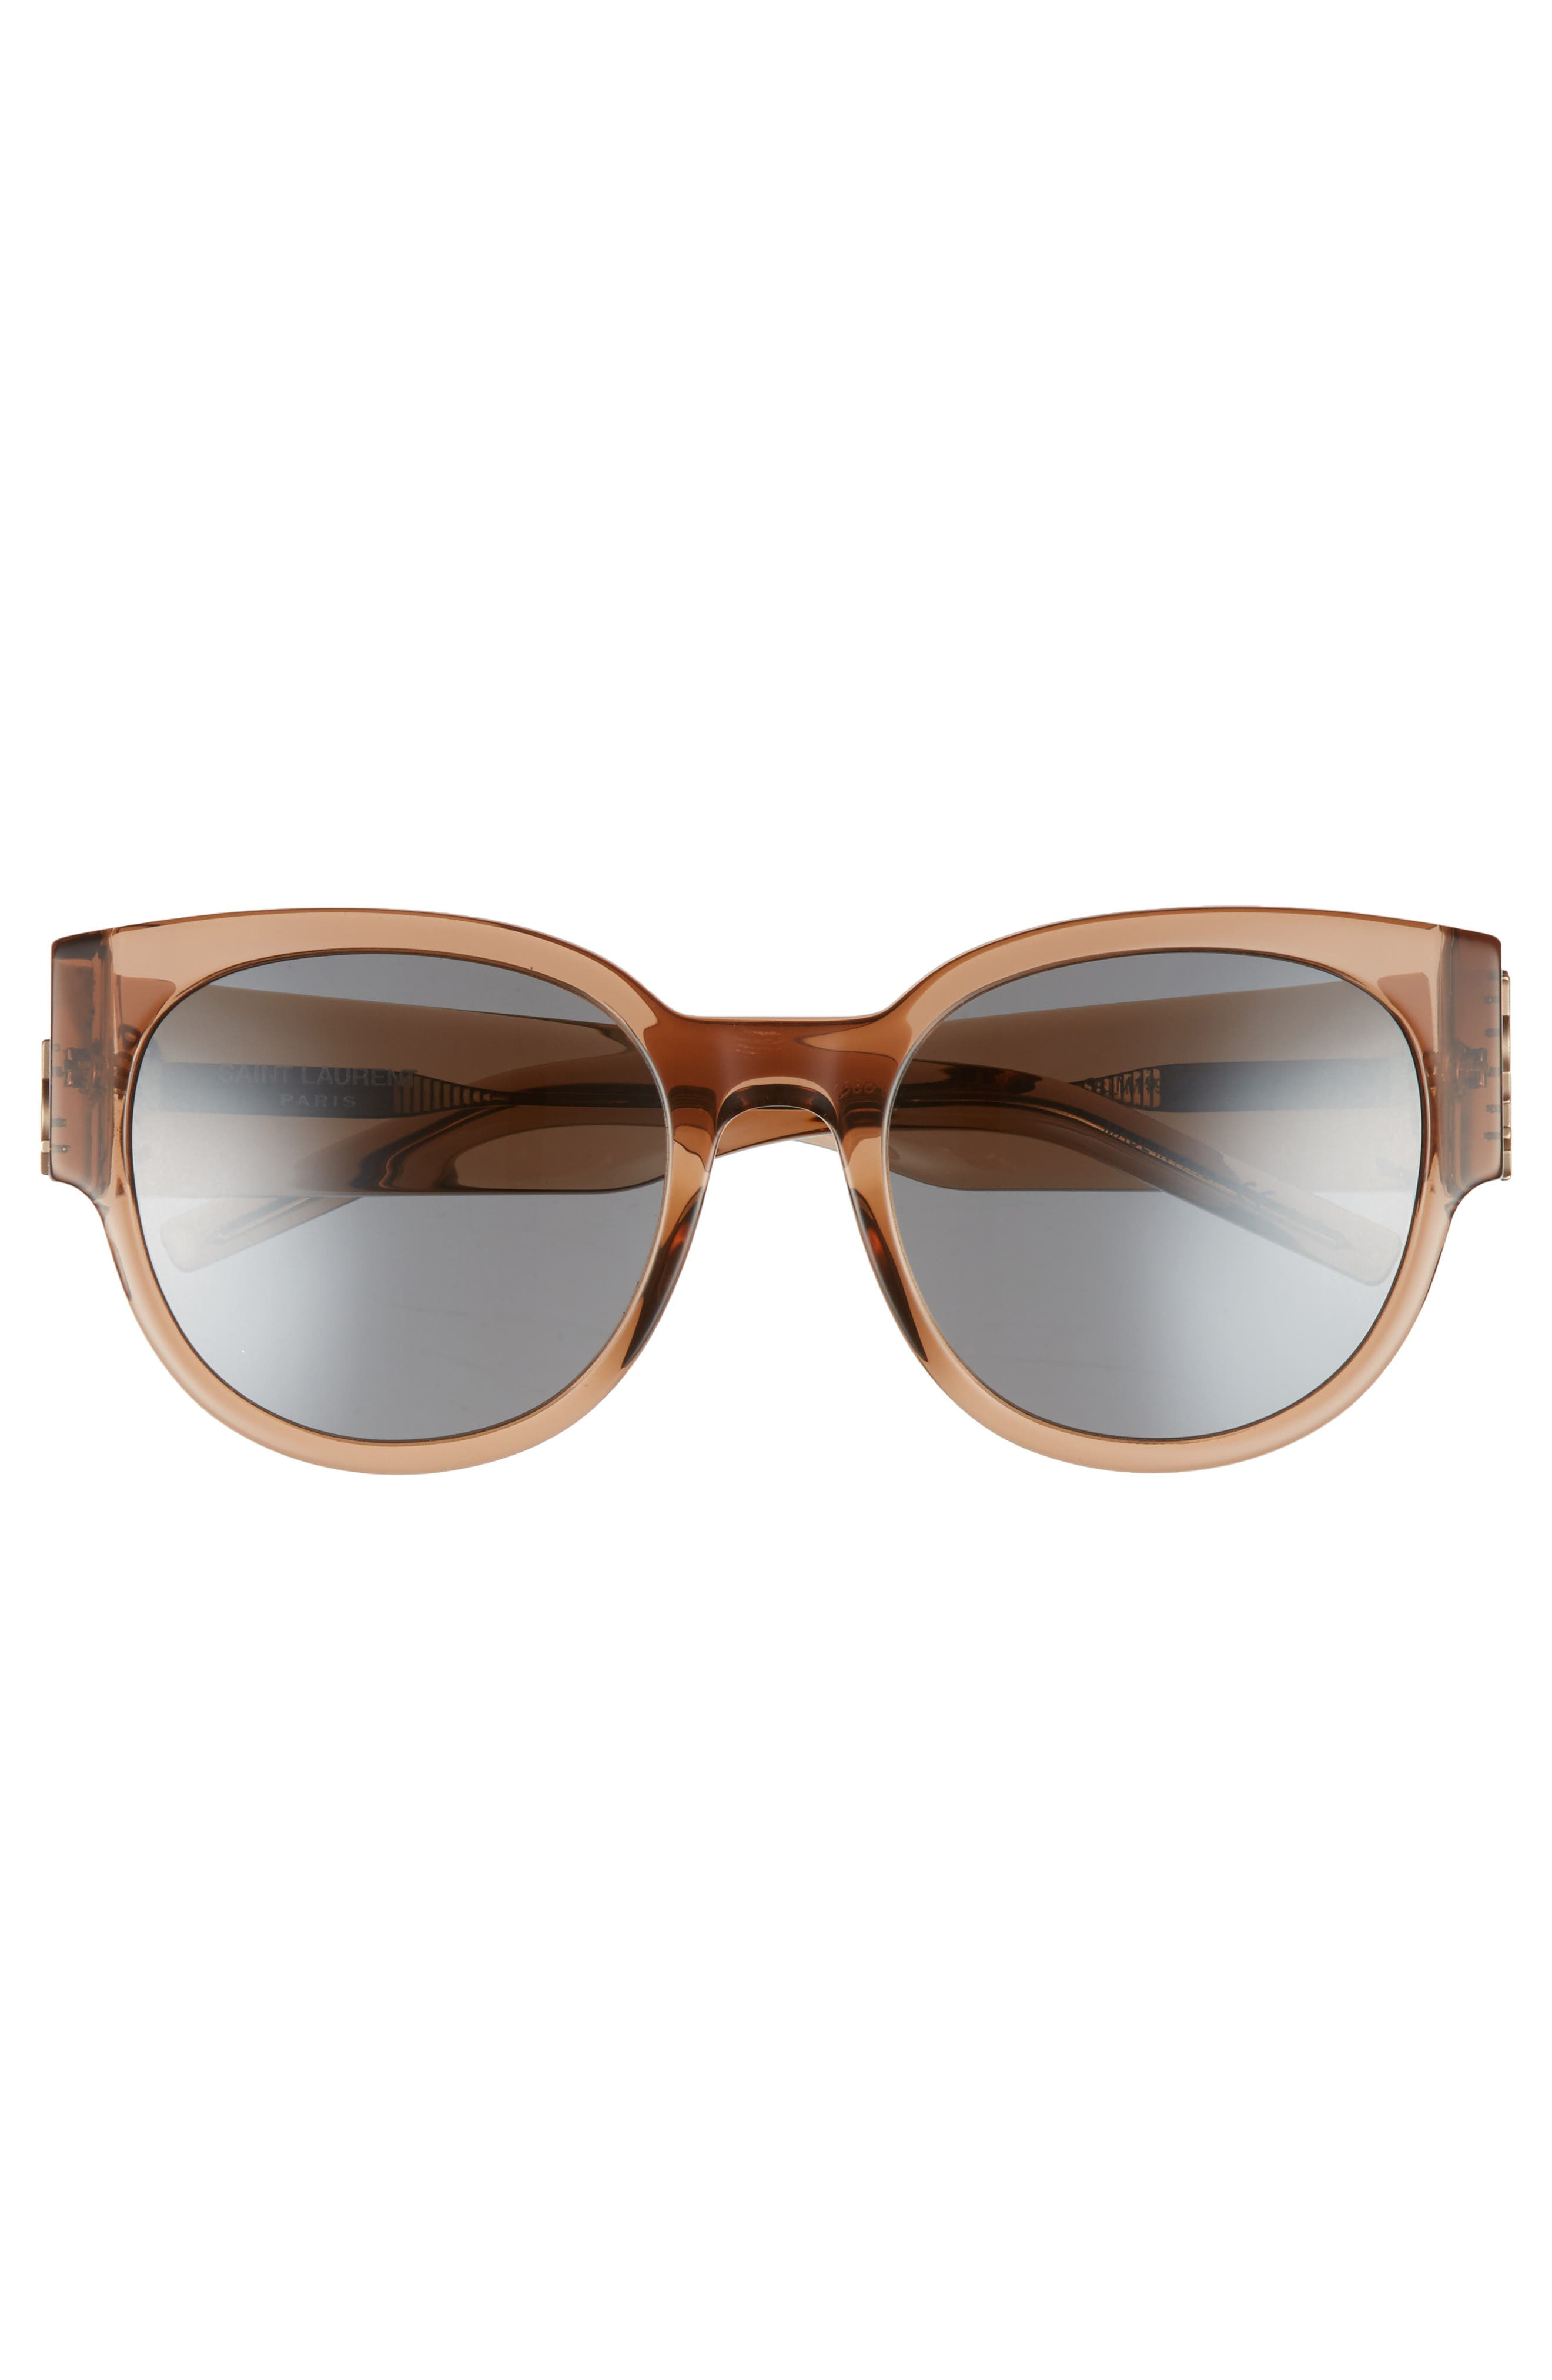 SL M19 54mm Cat Eye Sunglasses,                             Alternate thumbnail 3, color,                             NUDE